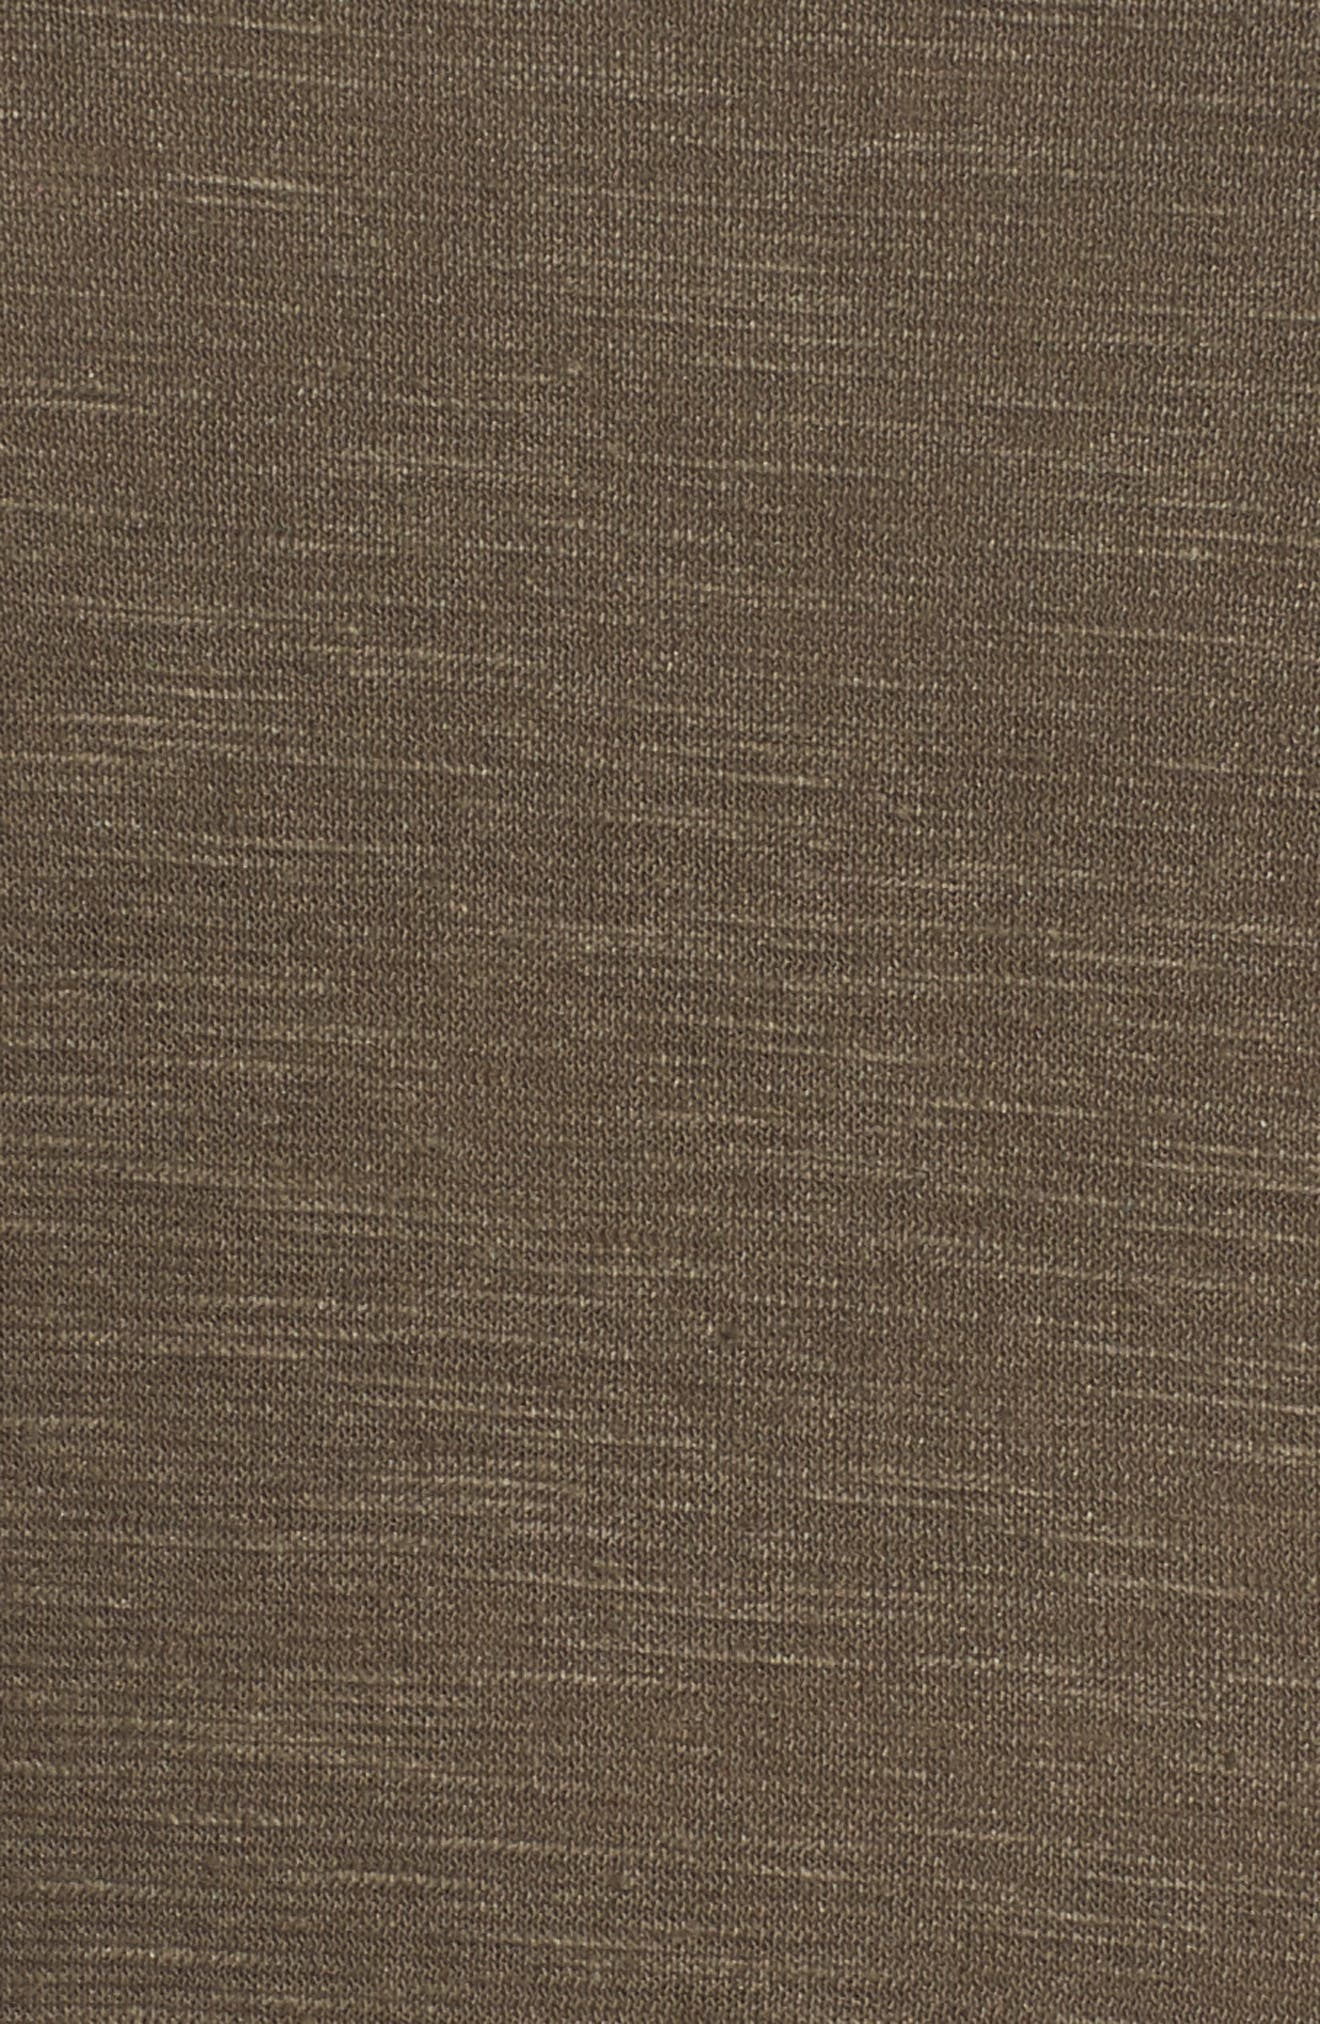 Scooped Neck Hemp & Cotton Midi Dress,                             Alternate thumbnail 6, color,                             359